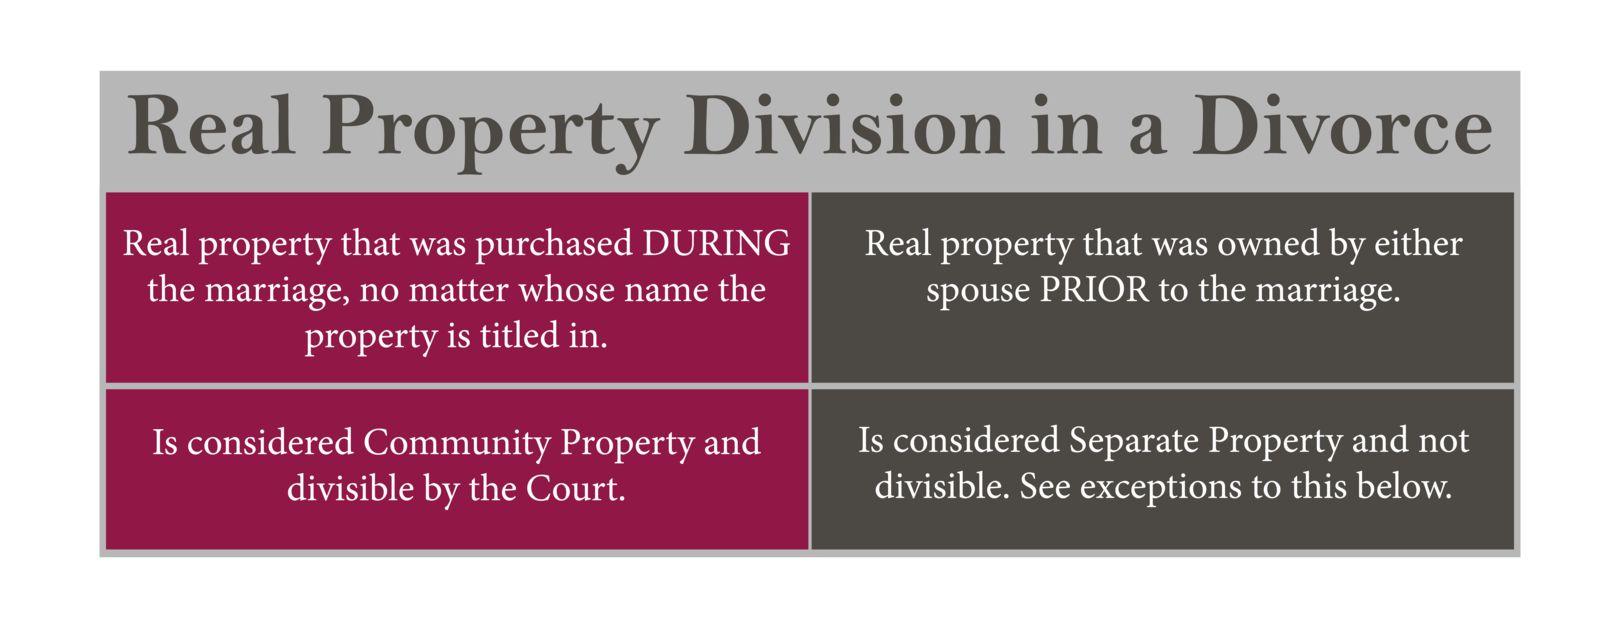 Divorce real estate division of property